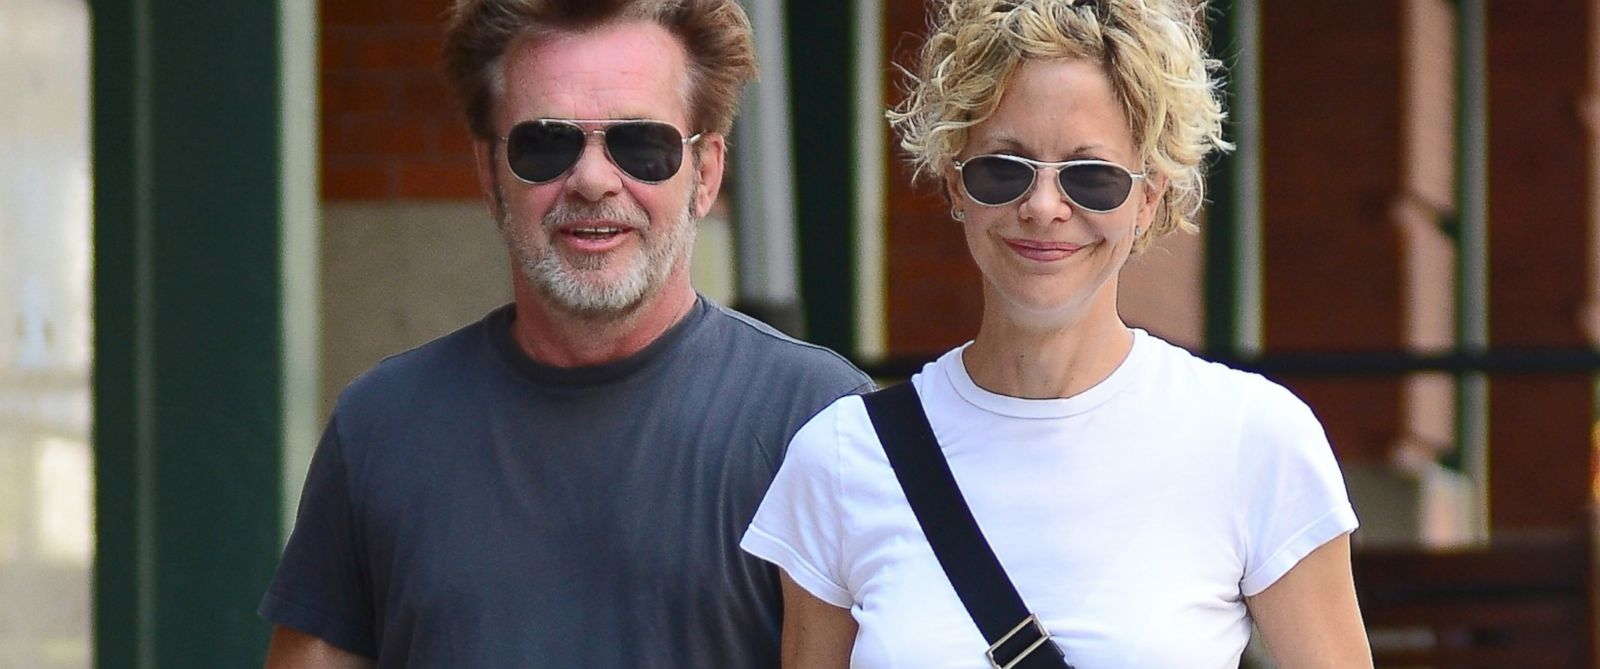 PHOTO: Meg Ryan and John Mellencamp are seen in Tribeca on June 24, 2013 in New York City.